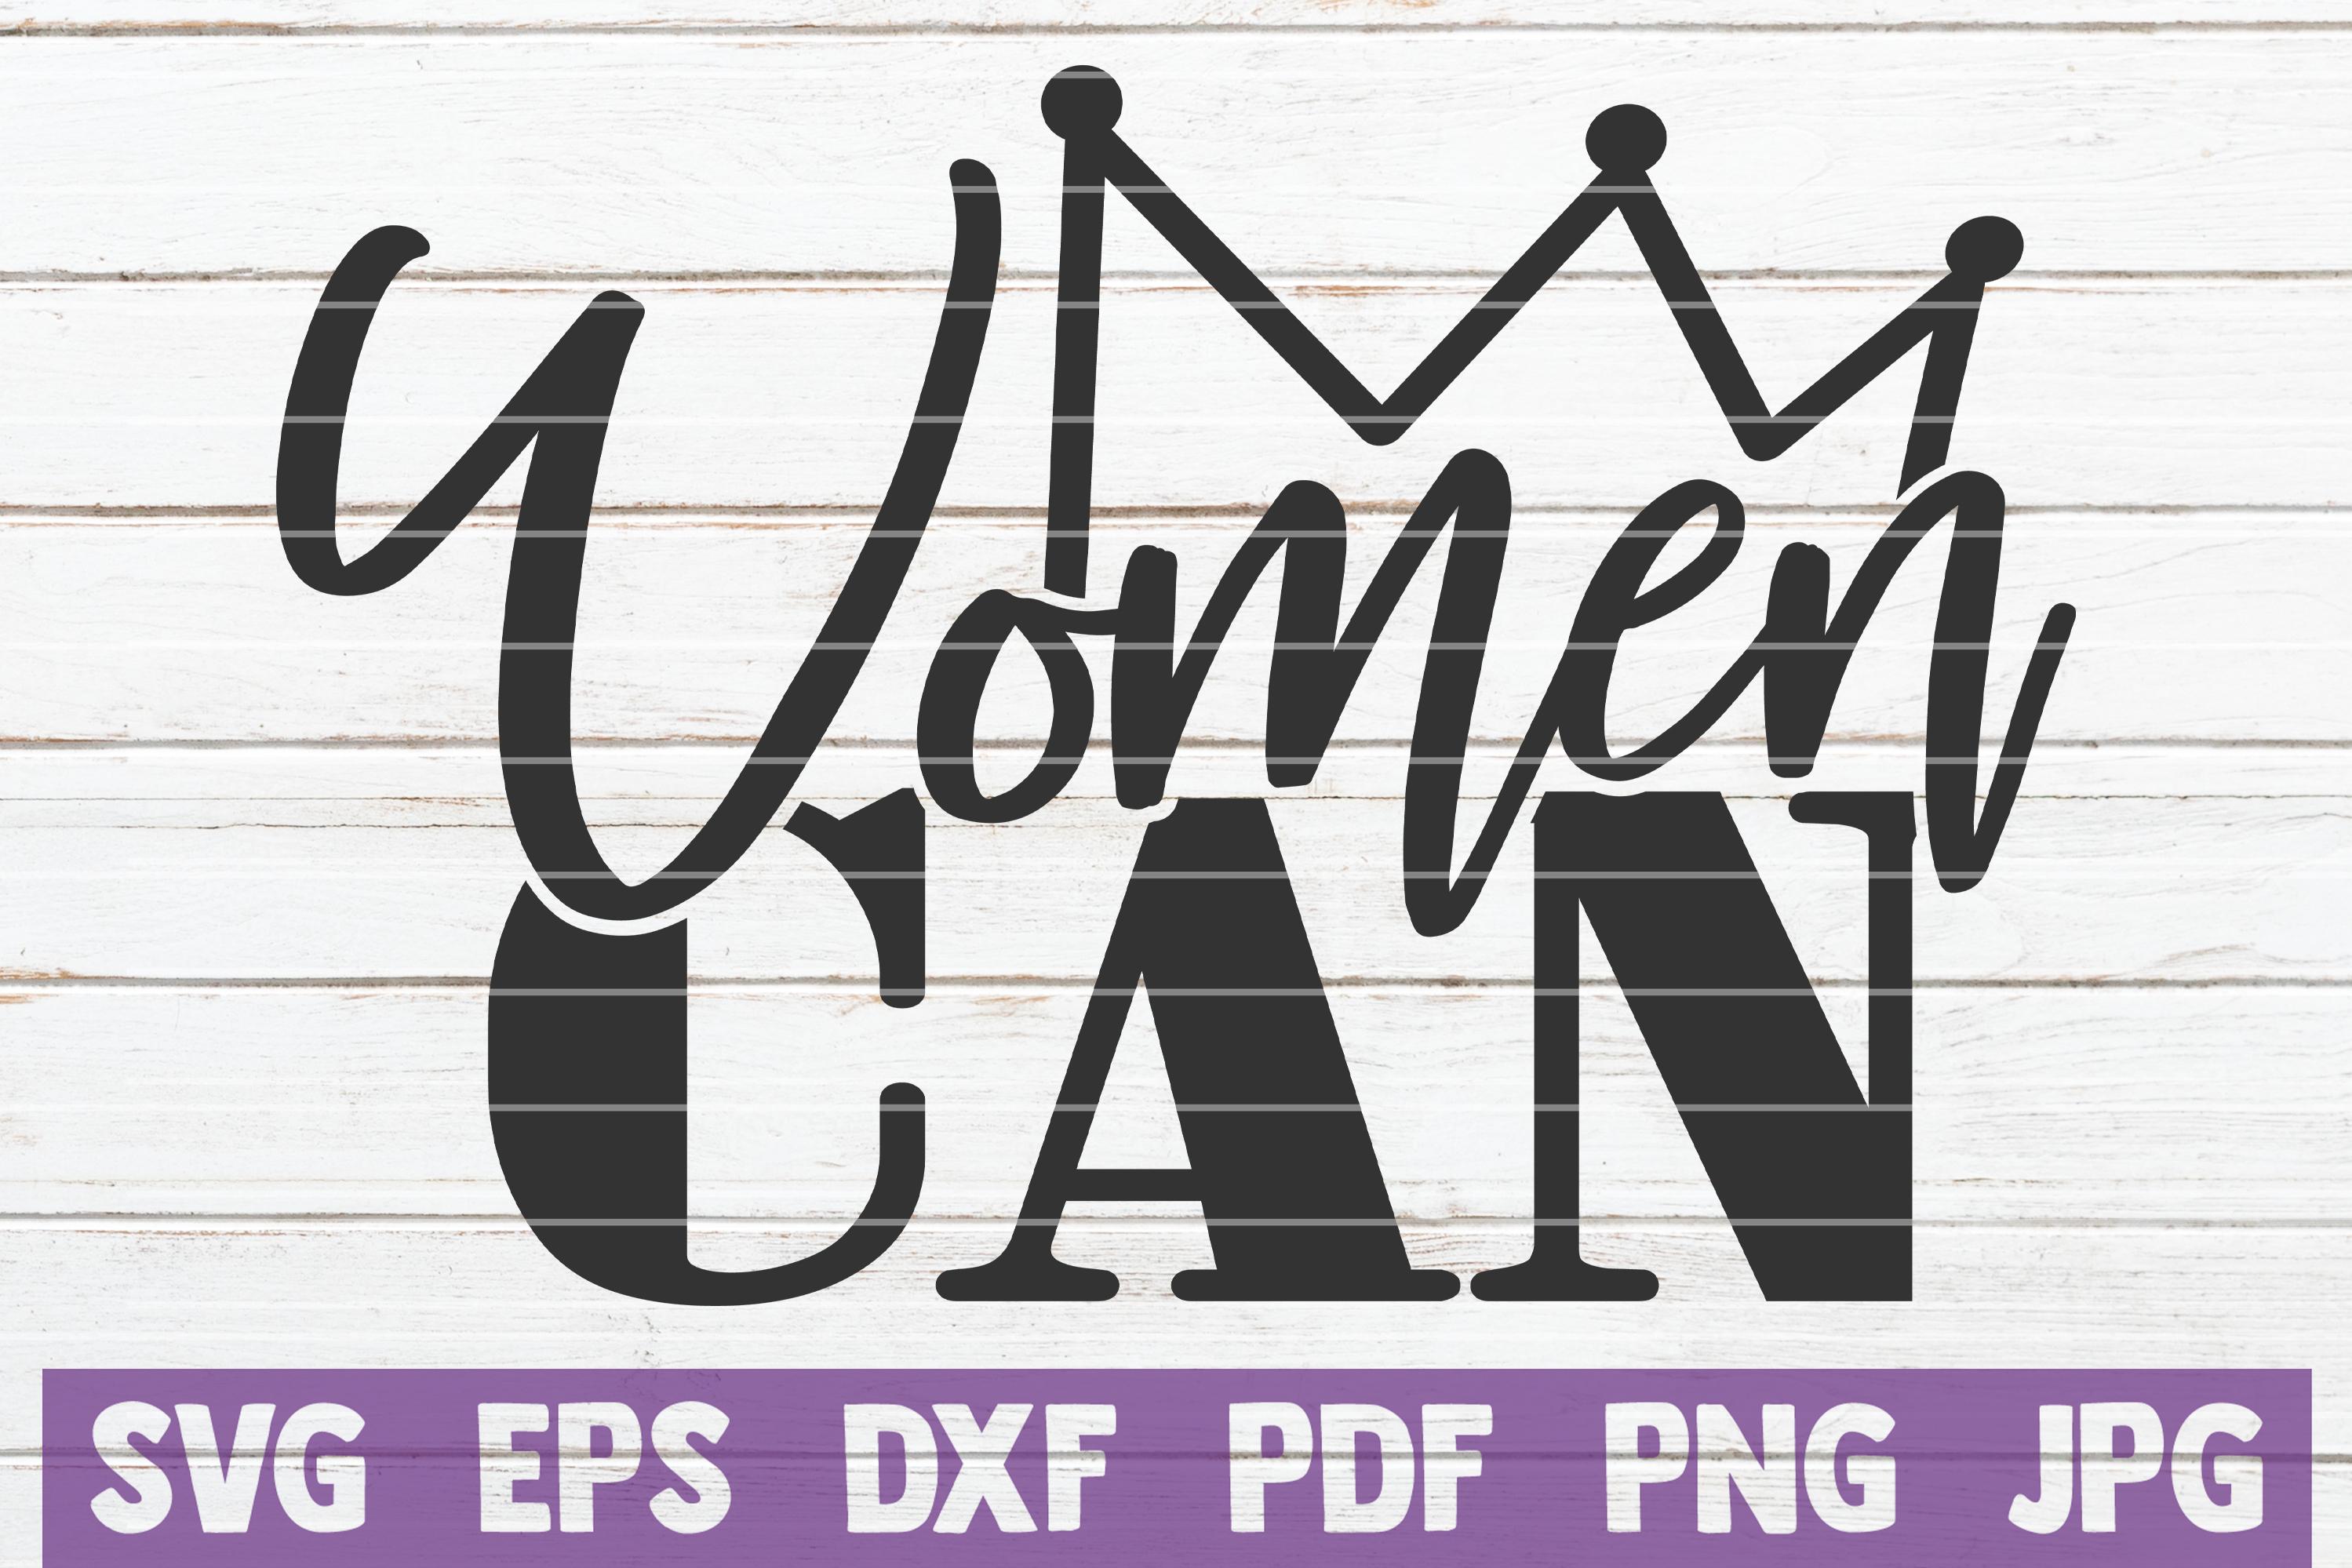 Girl power SVG Bundle | Woman Up SVG Cut Files example image 20